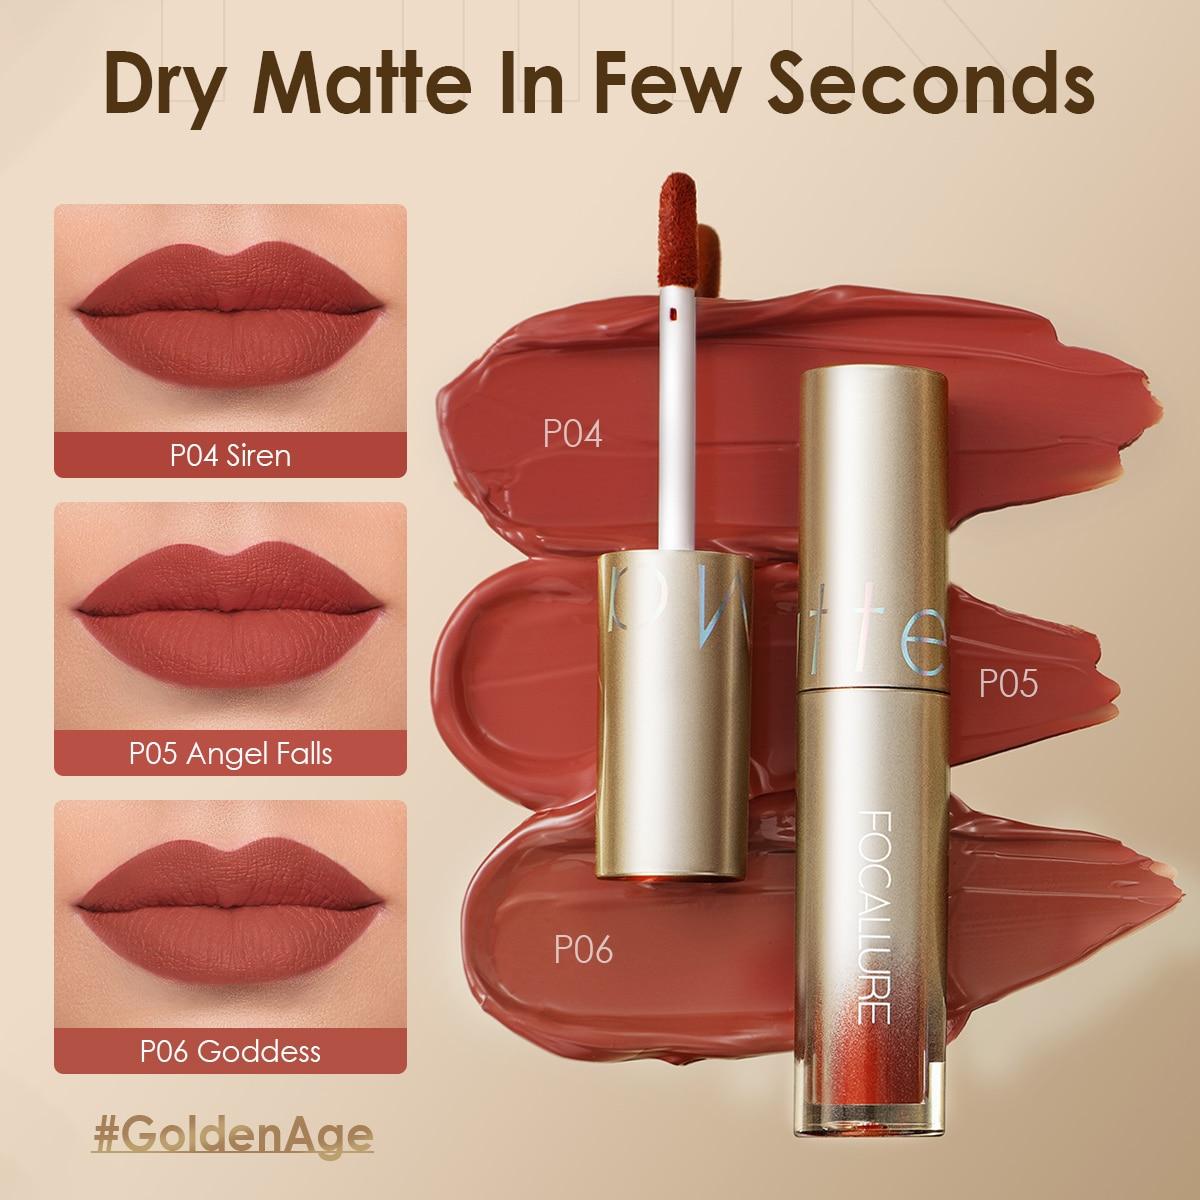 FOCALLURE 20 Colors Matte Lipstick Waterproof Longlasting Quick-Drying Glorious Lip Gloss Nude Velve